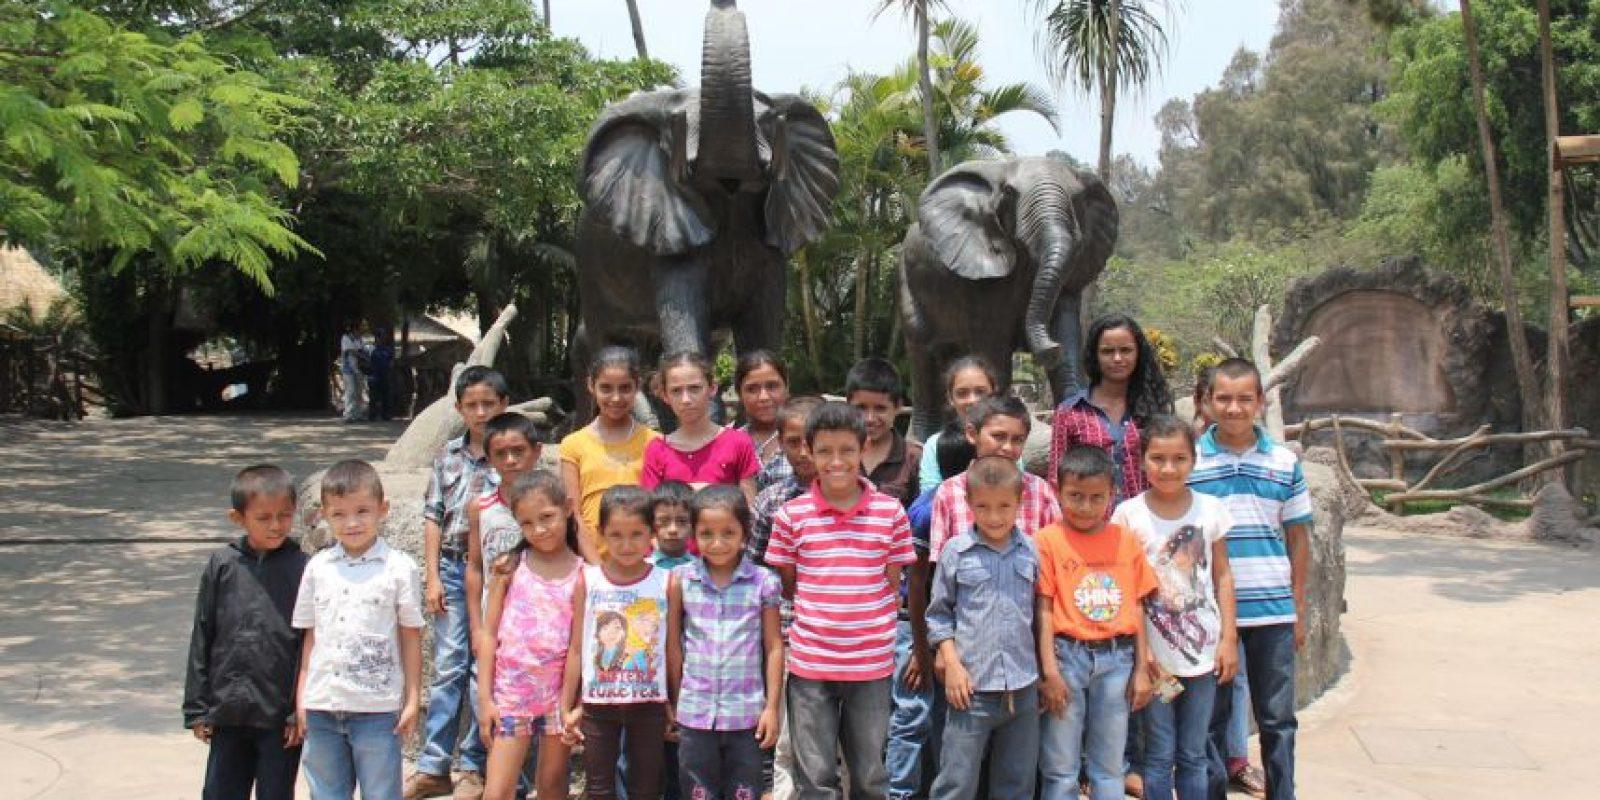 La visita al Zoológico. Foto:Mineduc